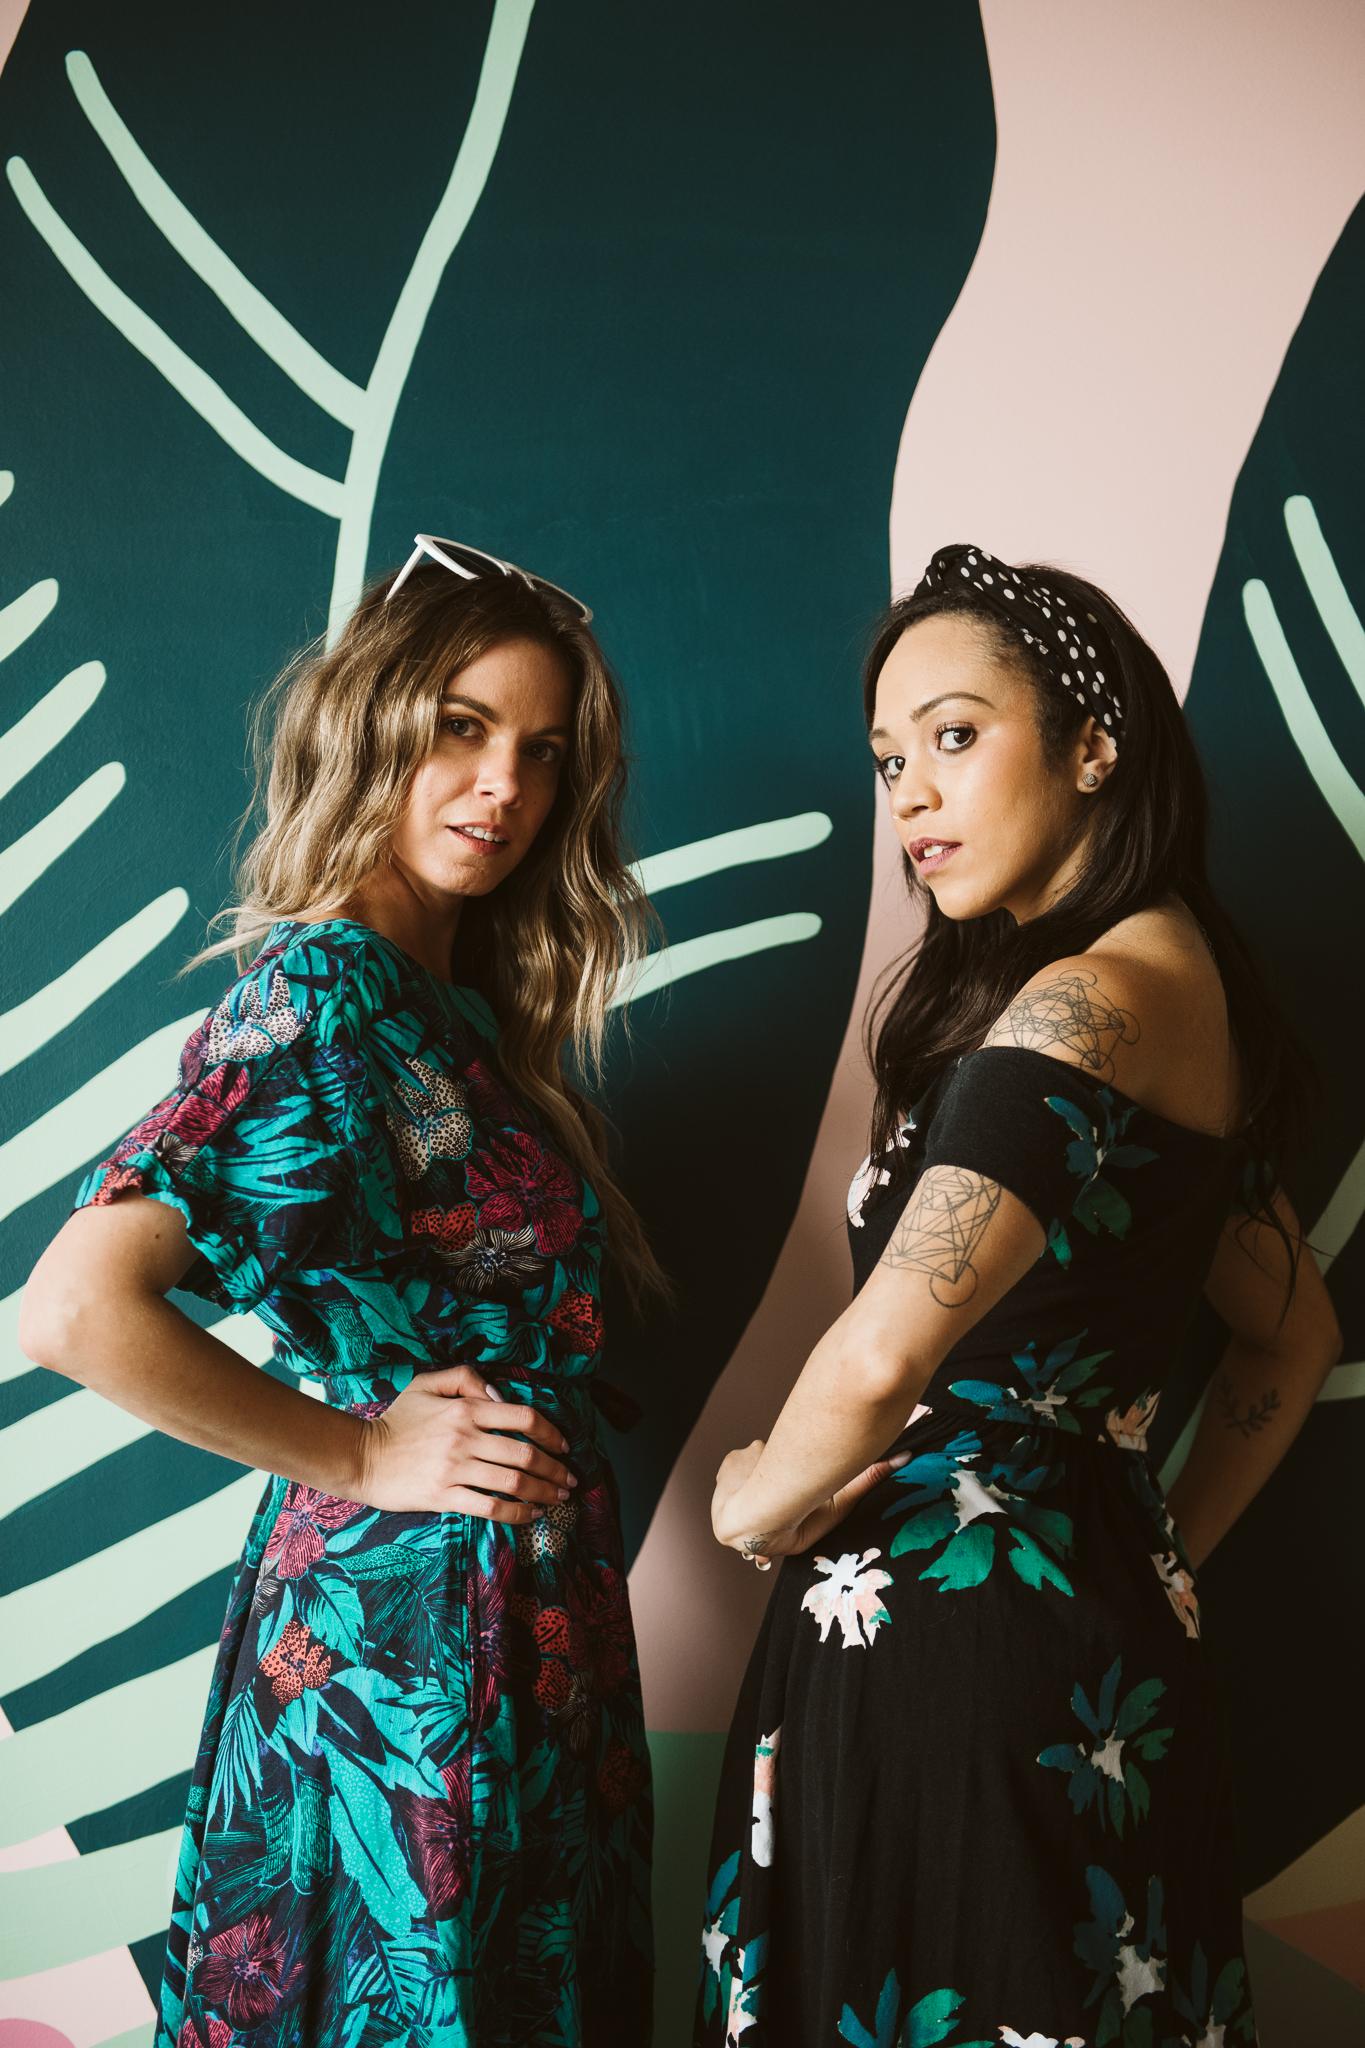 Amanda and Erin at Coconut Club